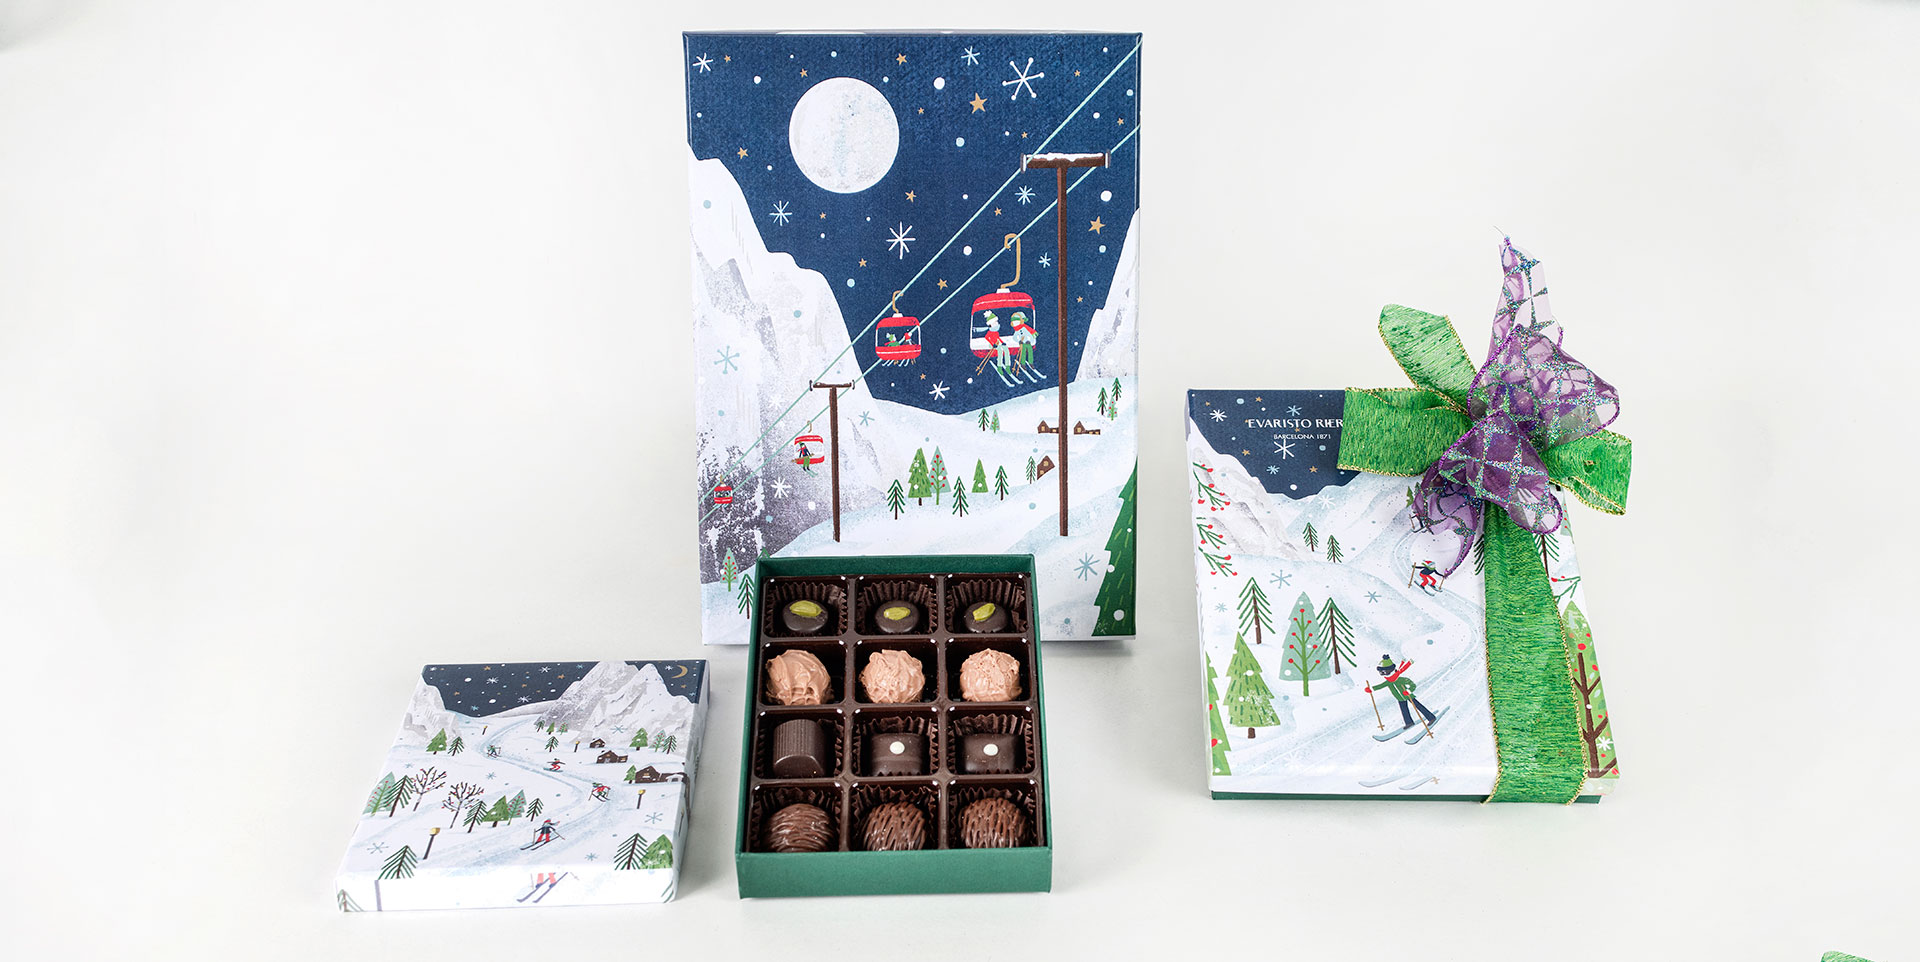 4-cajas-chocobox-basicas-standard-para-bomboneria-pasteleria-chocolates.jpg